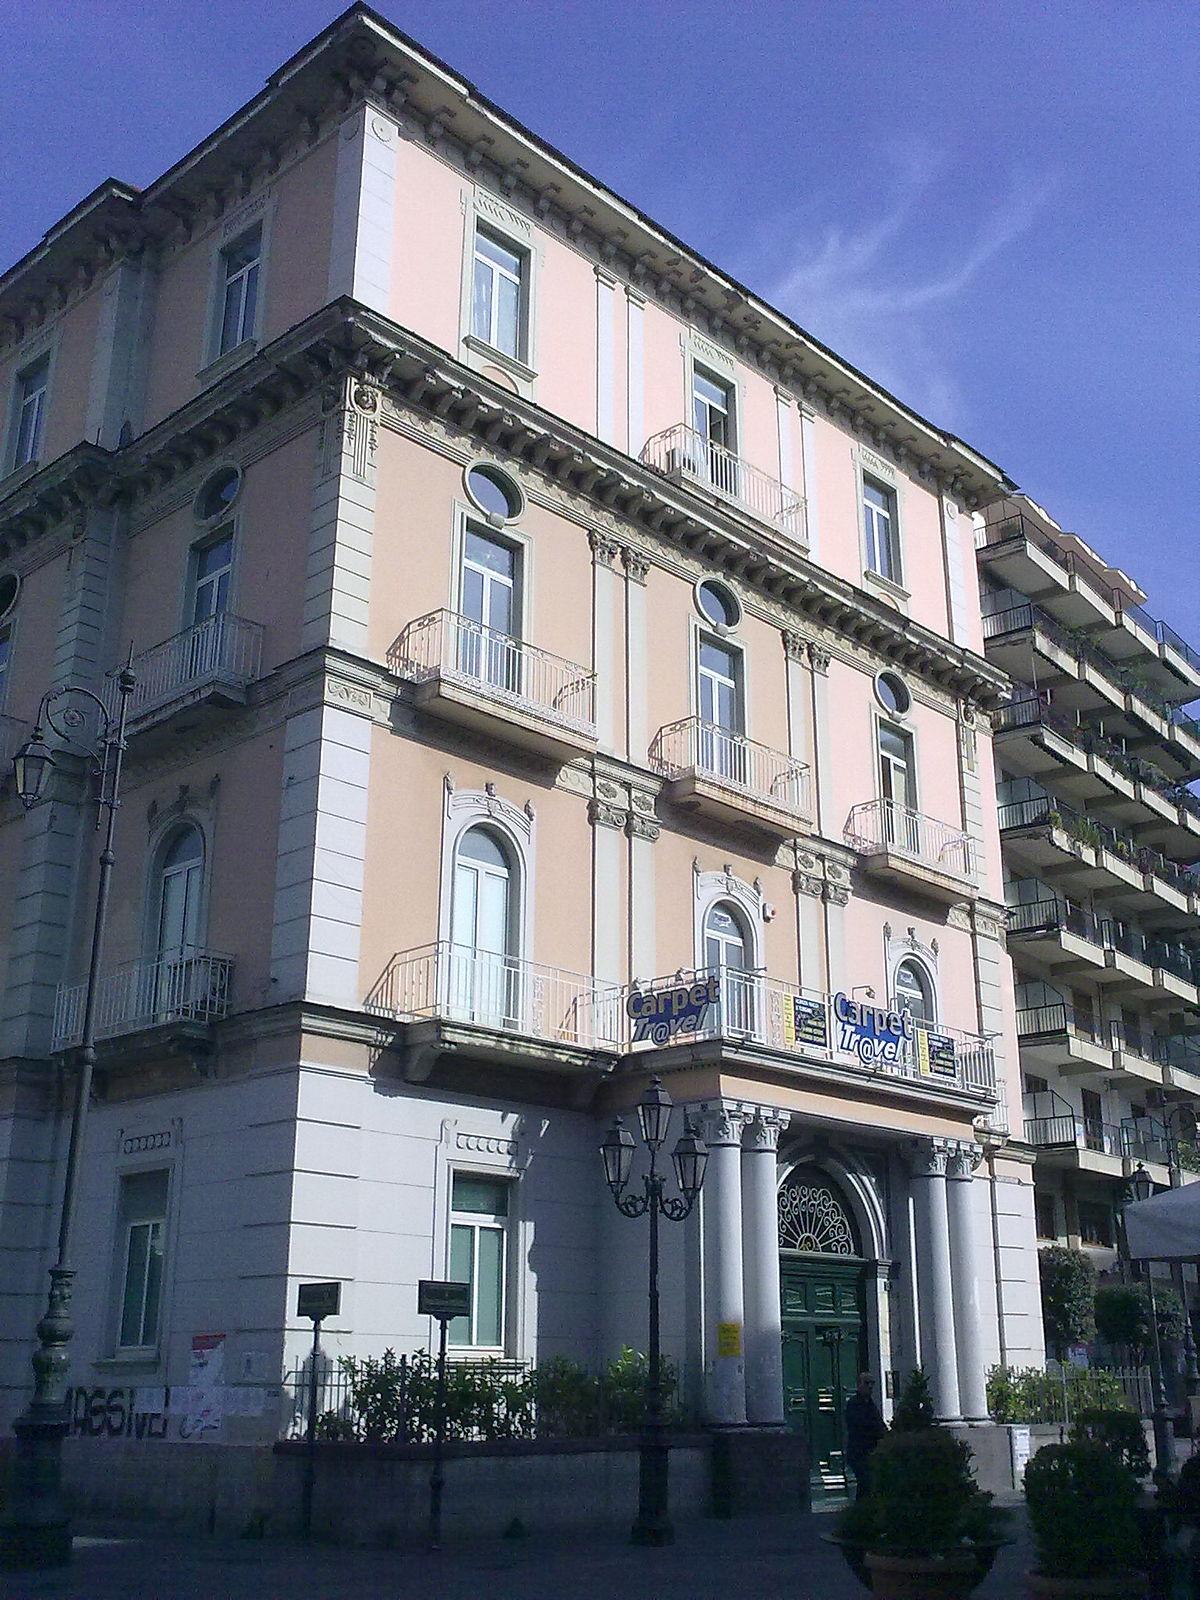 Palazzo gabola wikipedia for Palazzo a 4 piani